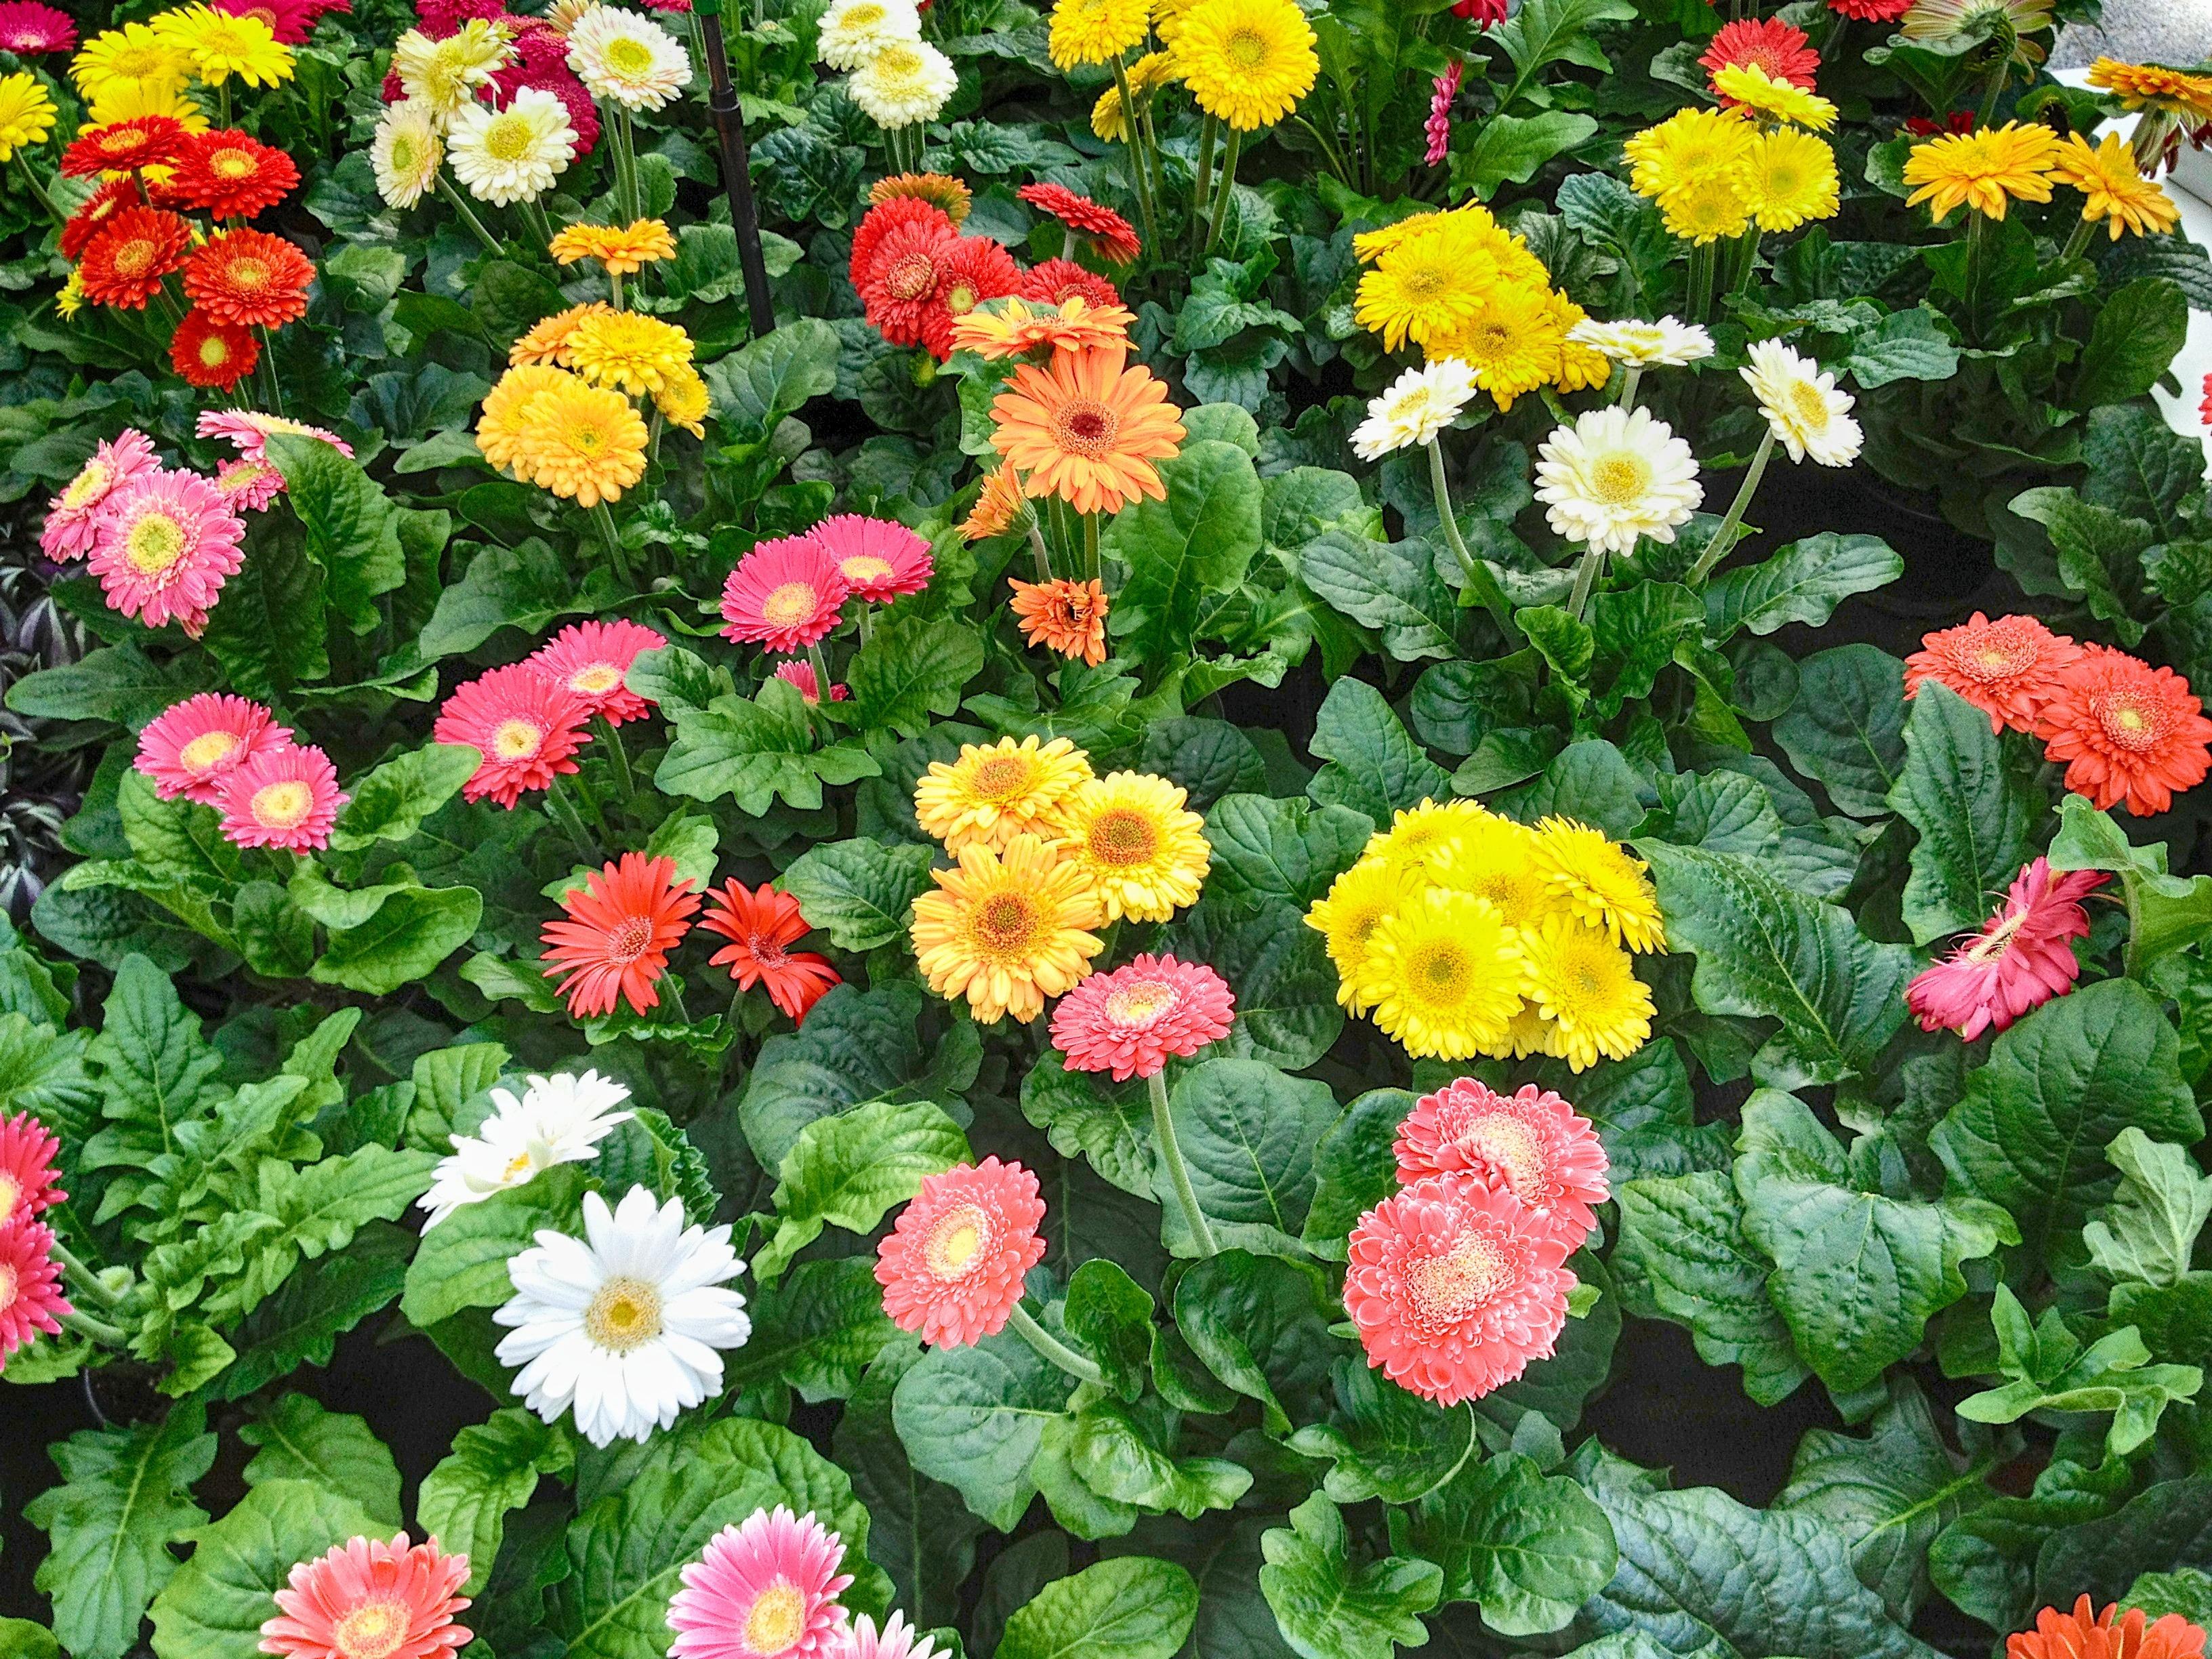 Free Images Nature Flower Summer Spring Macro Garden Plants